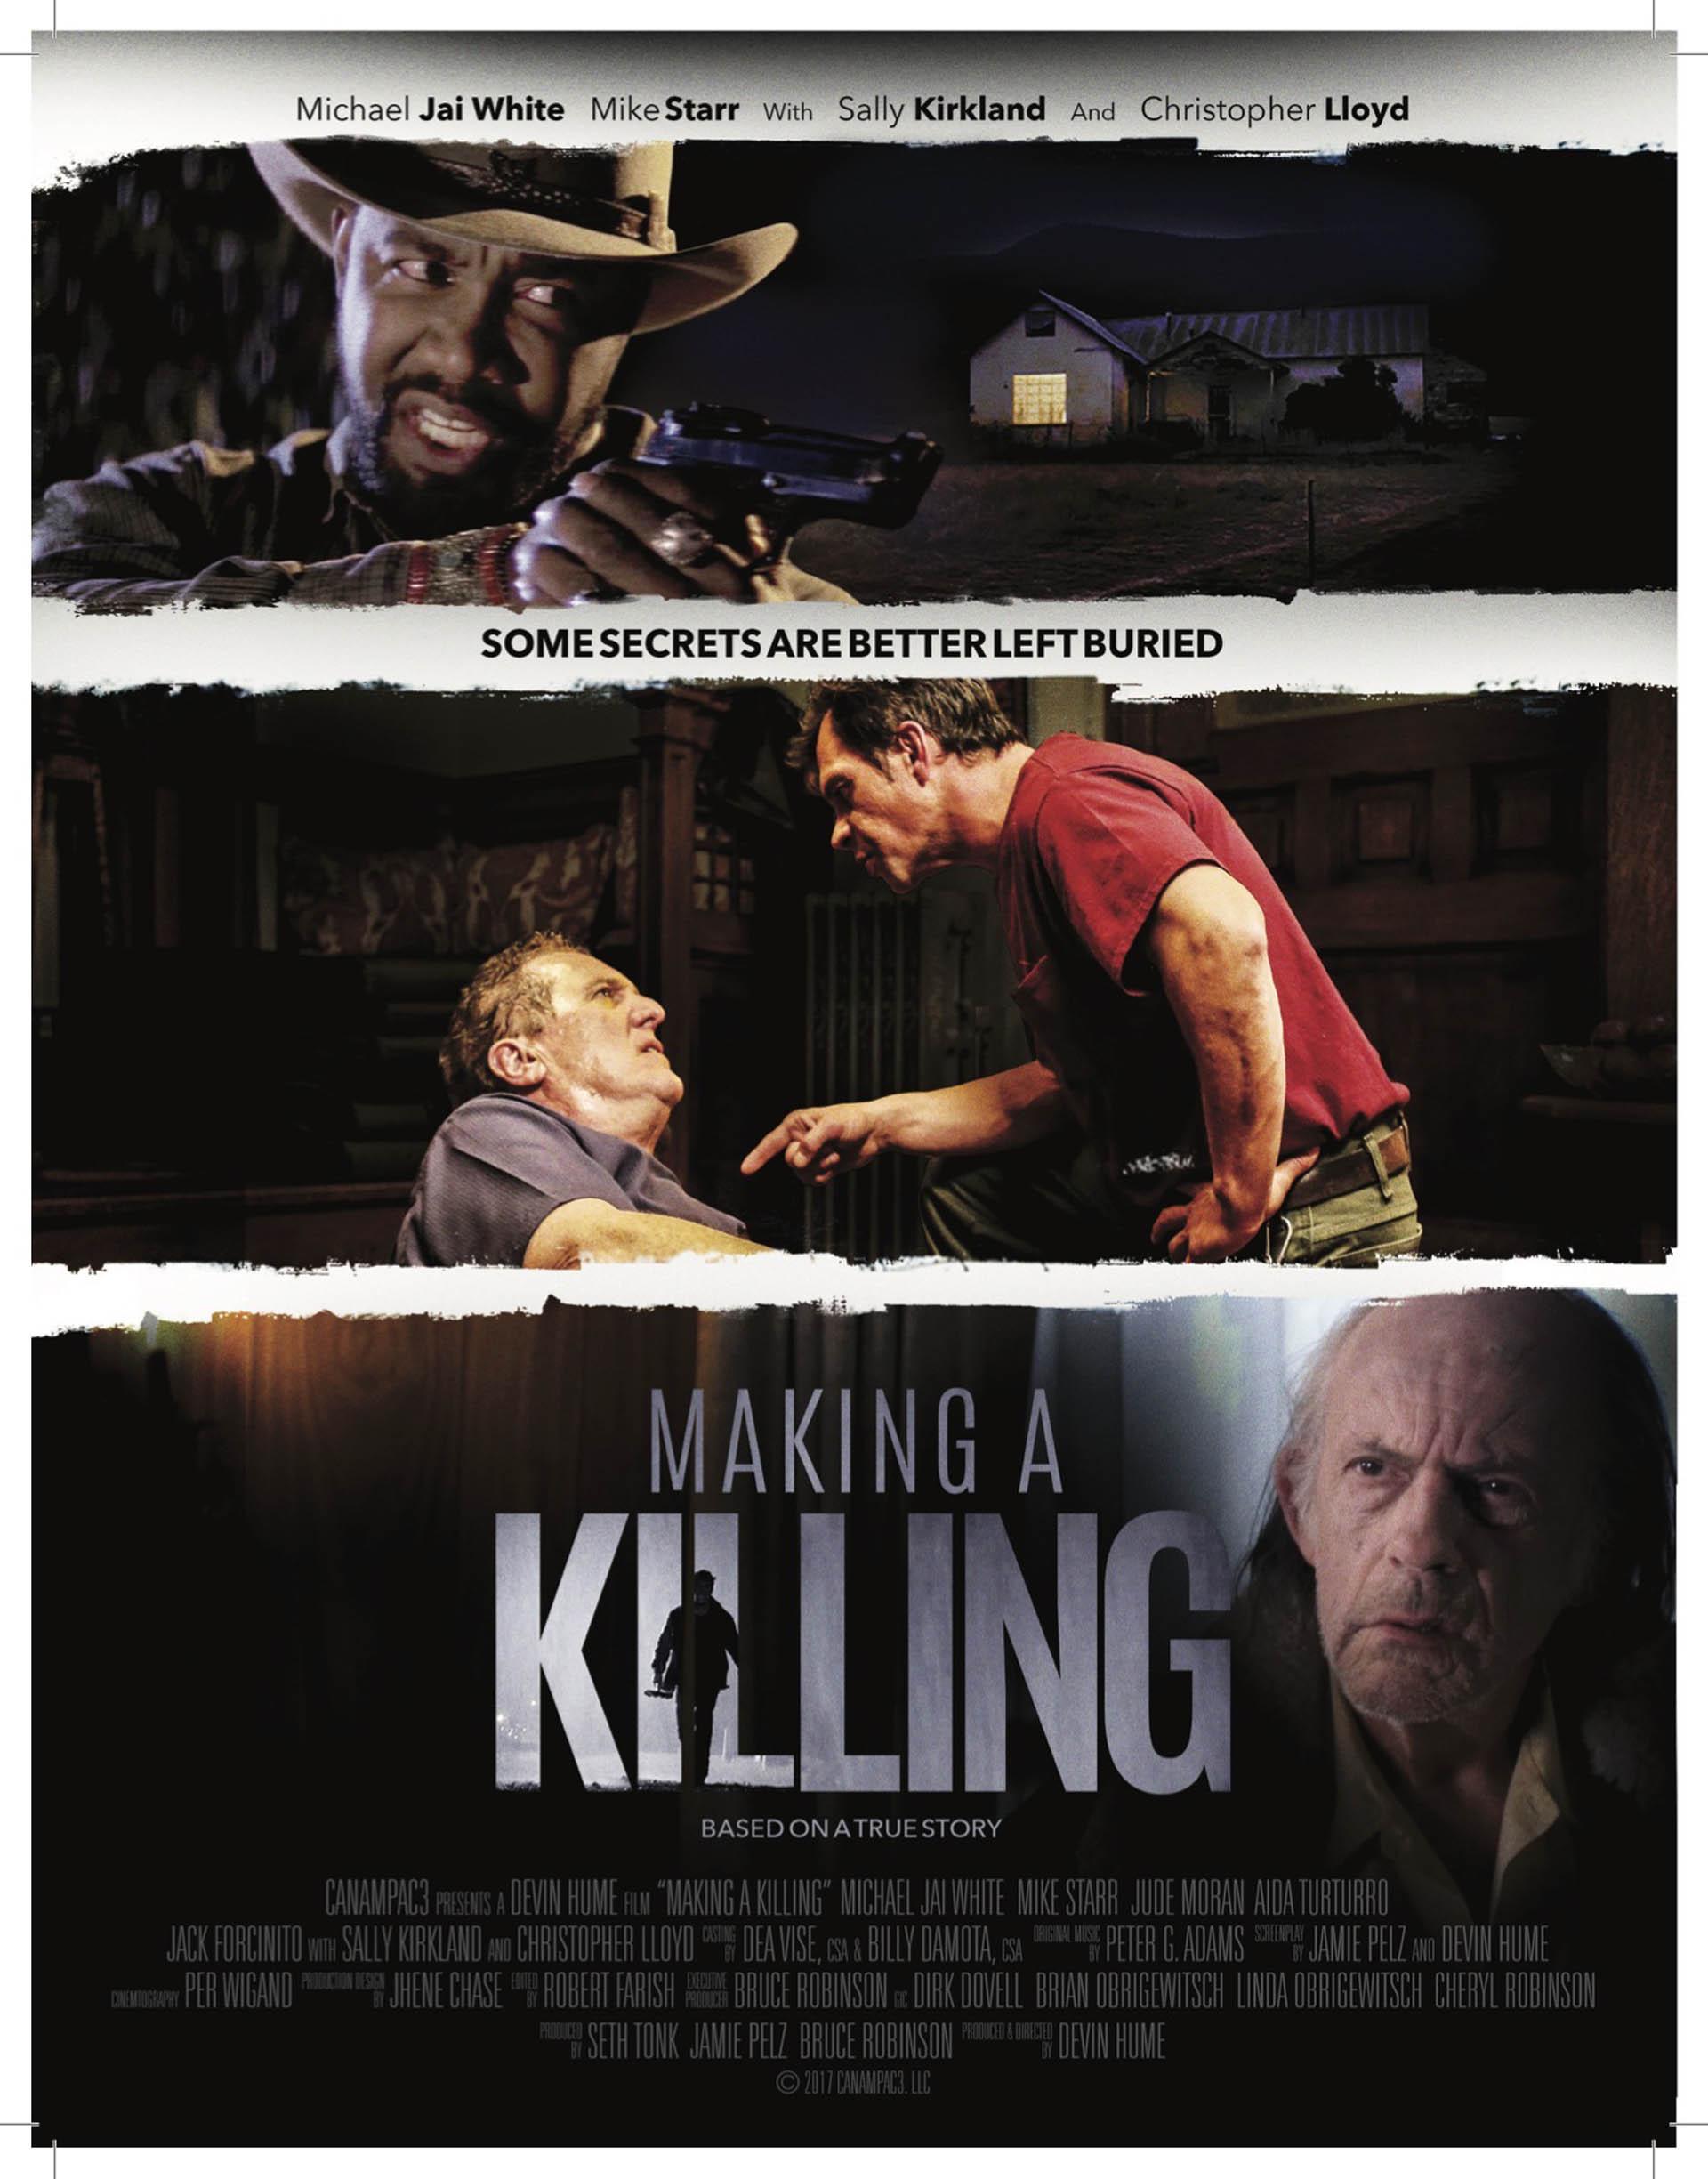 Making A Killing poster.jpg